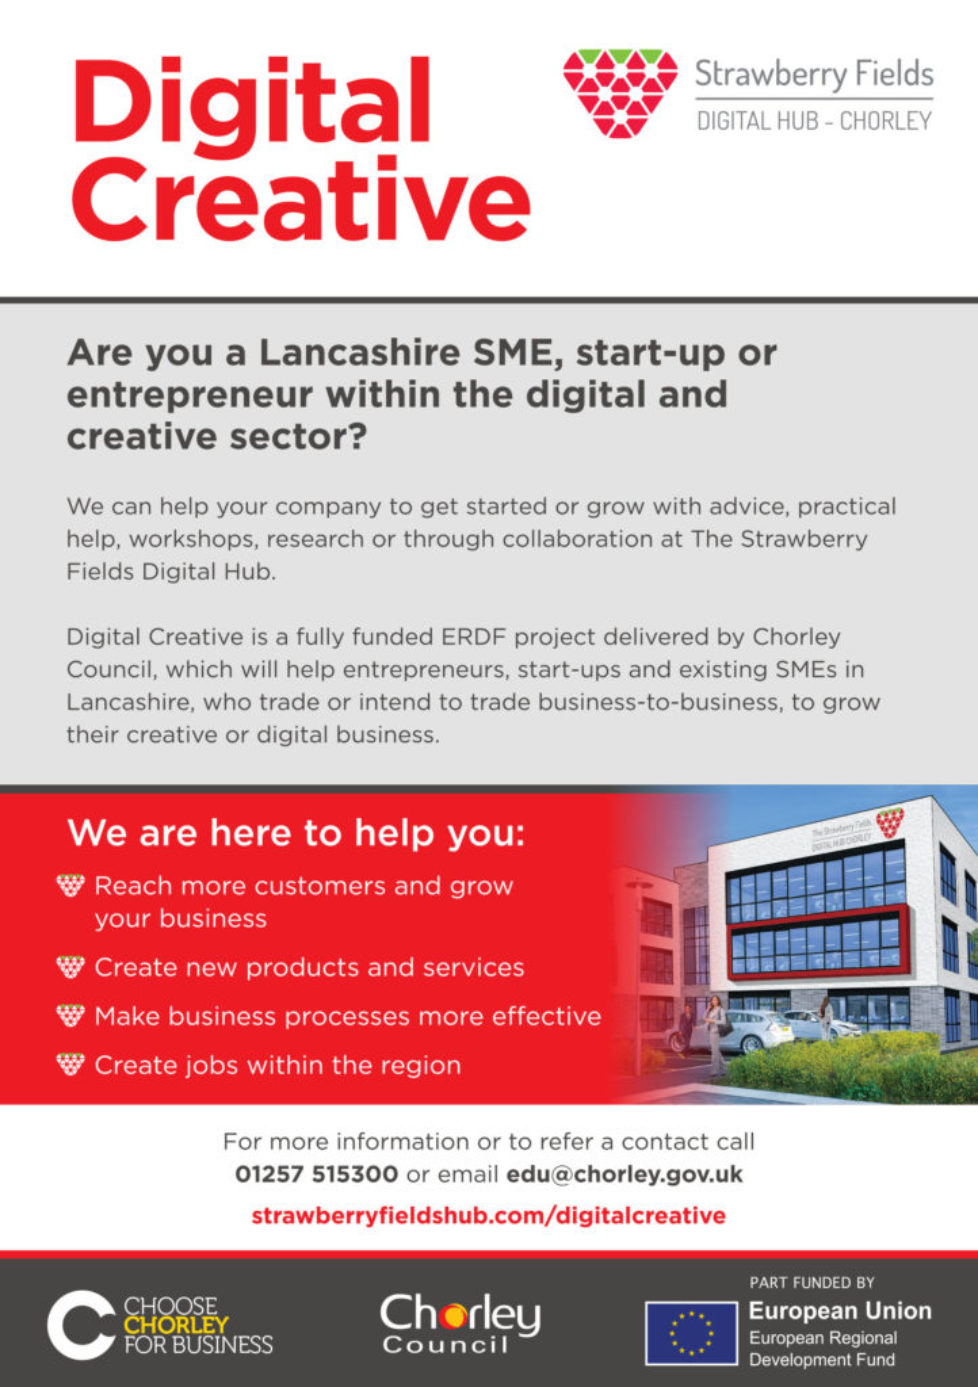 Digital Creative Business Support